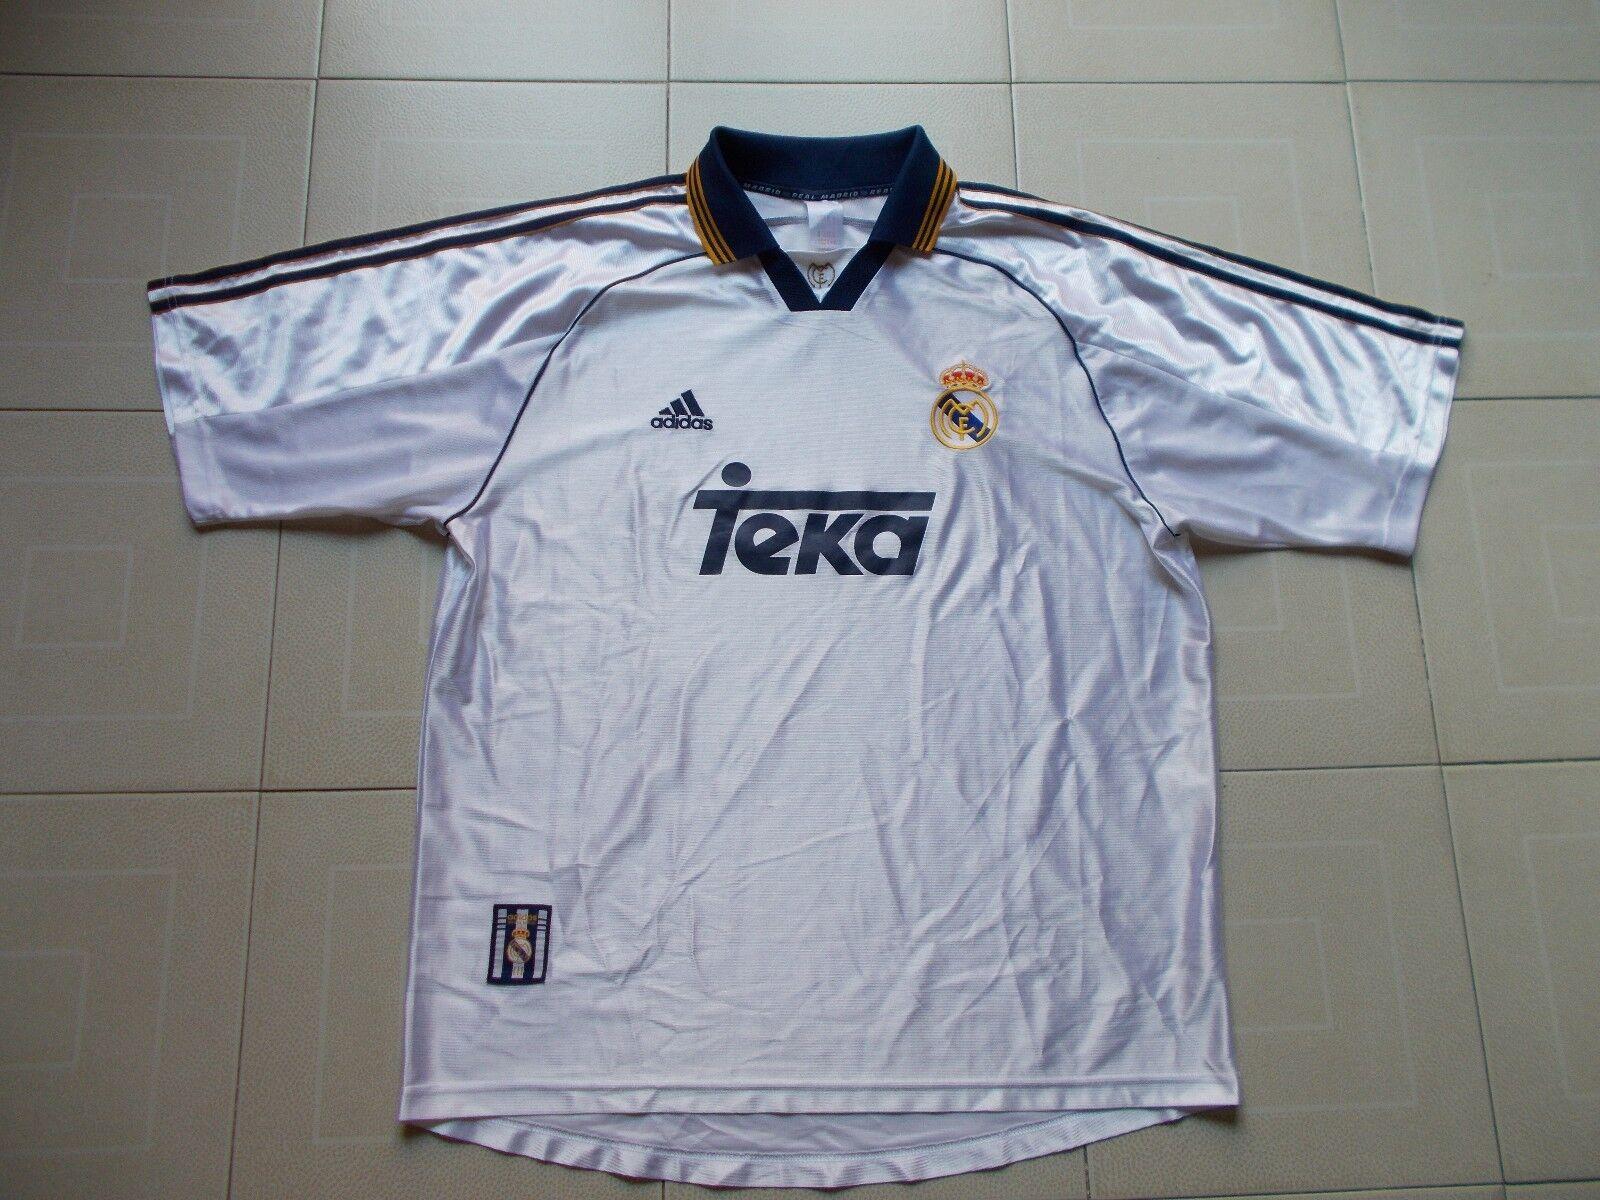 VINTAGE 1998-1999 REAL MADRID Camiseta Futbol Adidas Teka Shirt Trikot Maglia XL